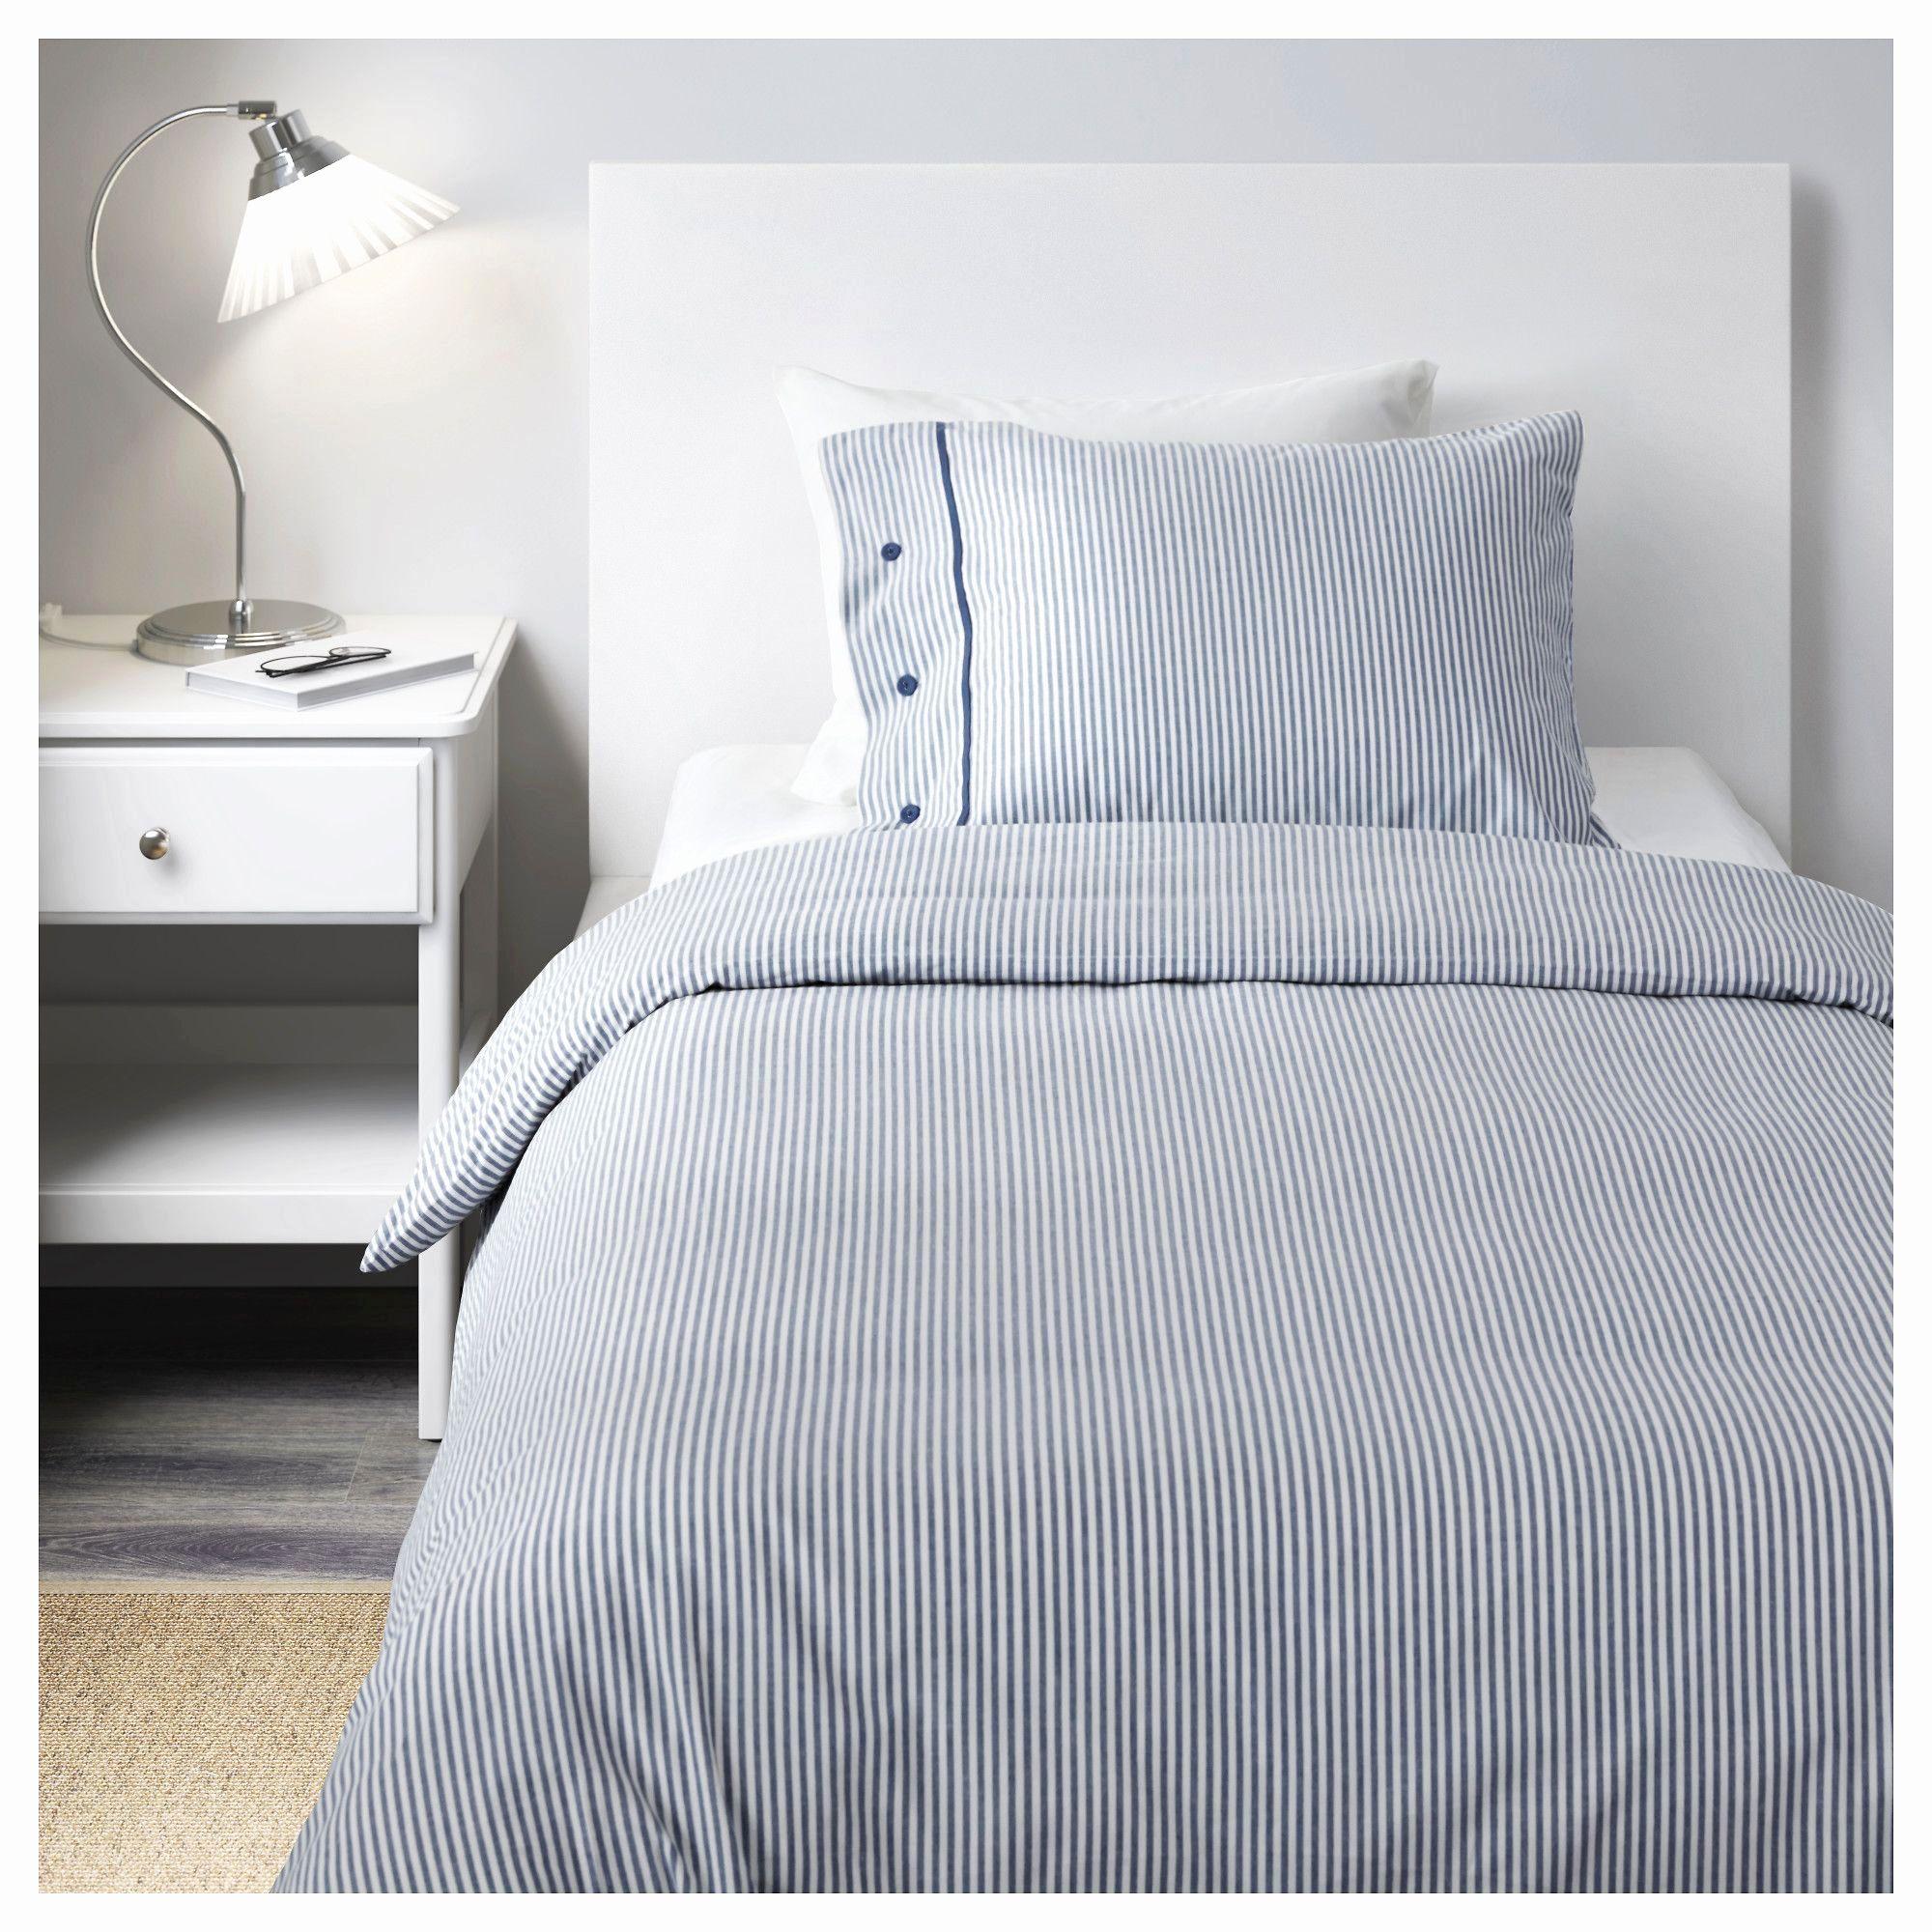 Parure De Couette 200x200 Parure De Couette 200x200 Parure Housses De Couette Drap Housse Taies 140x190 Jeudi 24 Ikea Bed Bed Linens Luxury Bed Duvet Covers